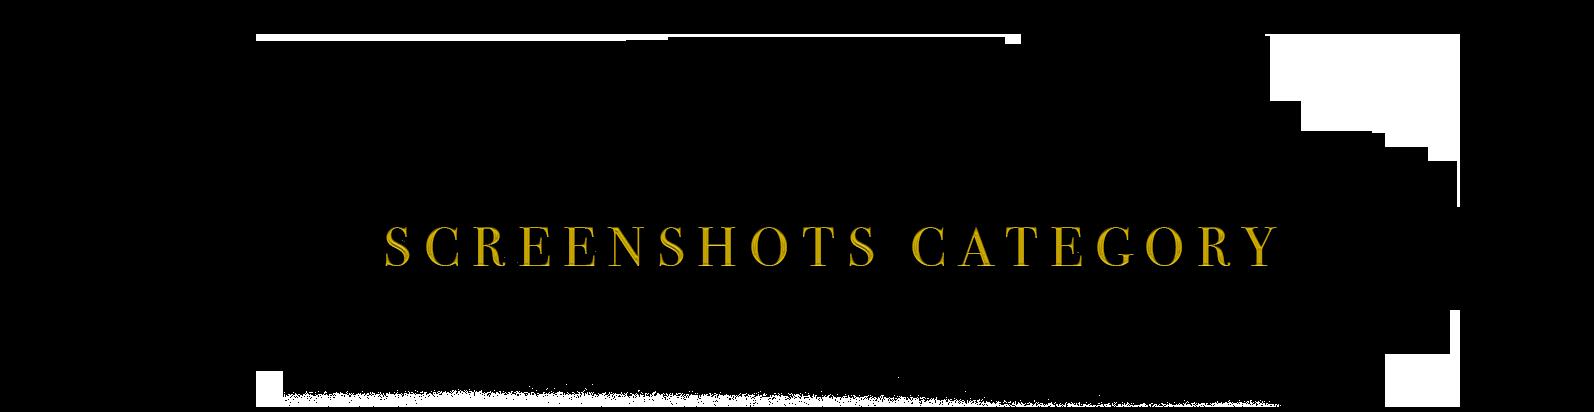 Screenshots_category.png